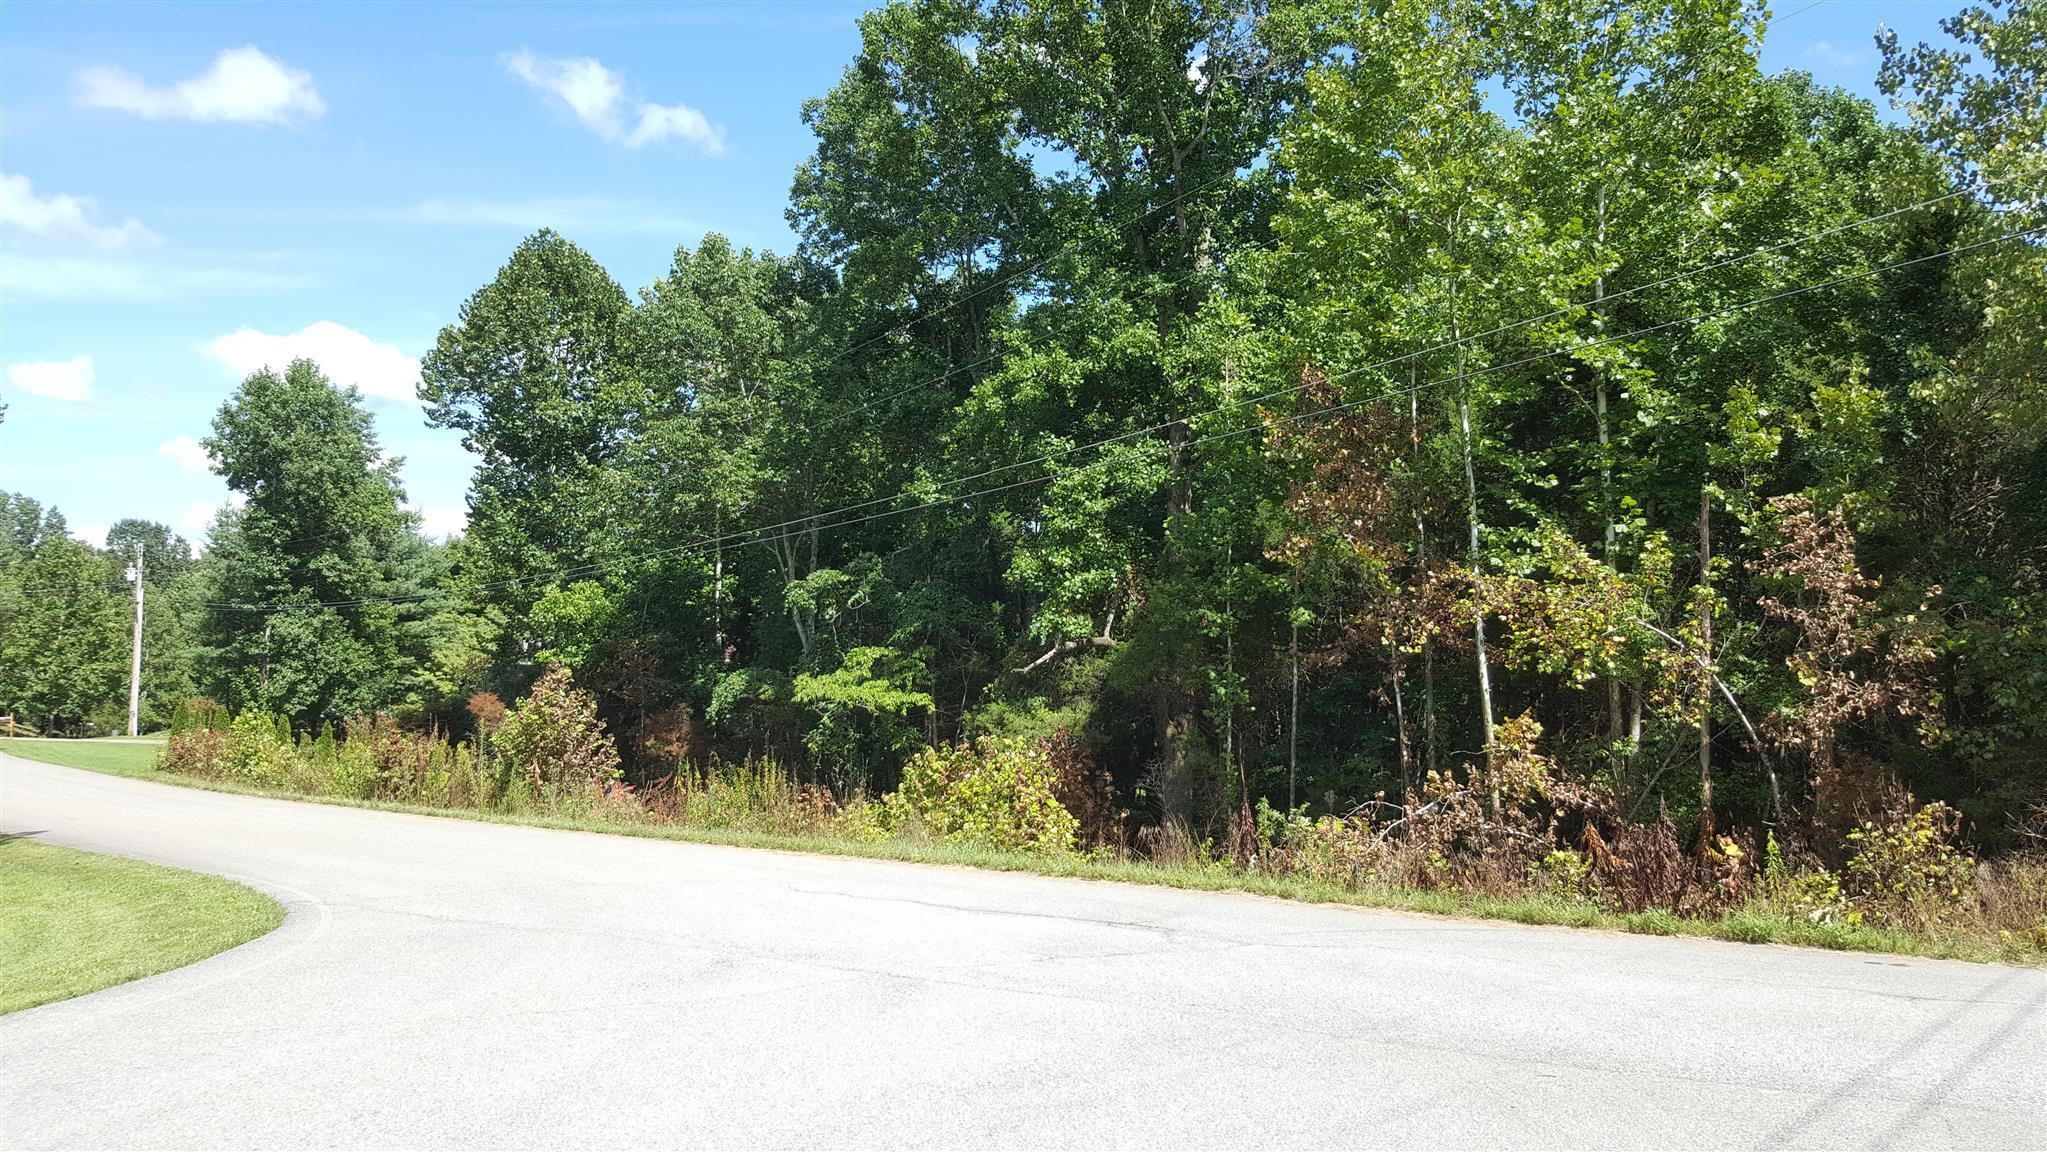 0 Beechwood Cir, Burns, TN 37029 - Burns, TN real estate listing